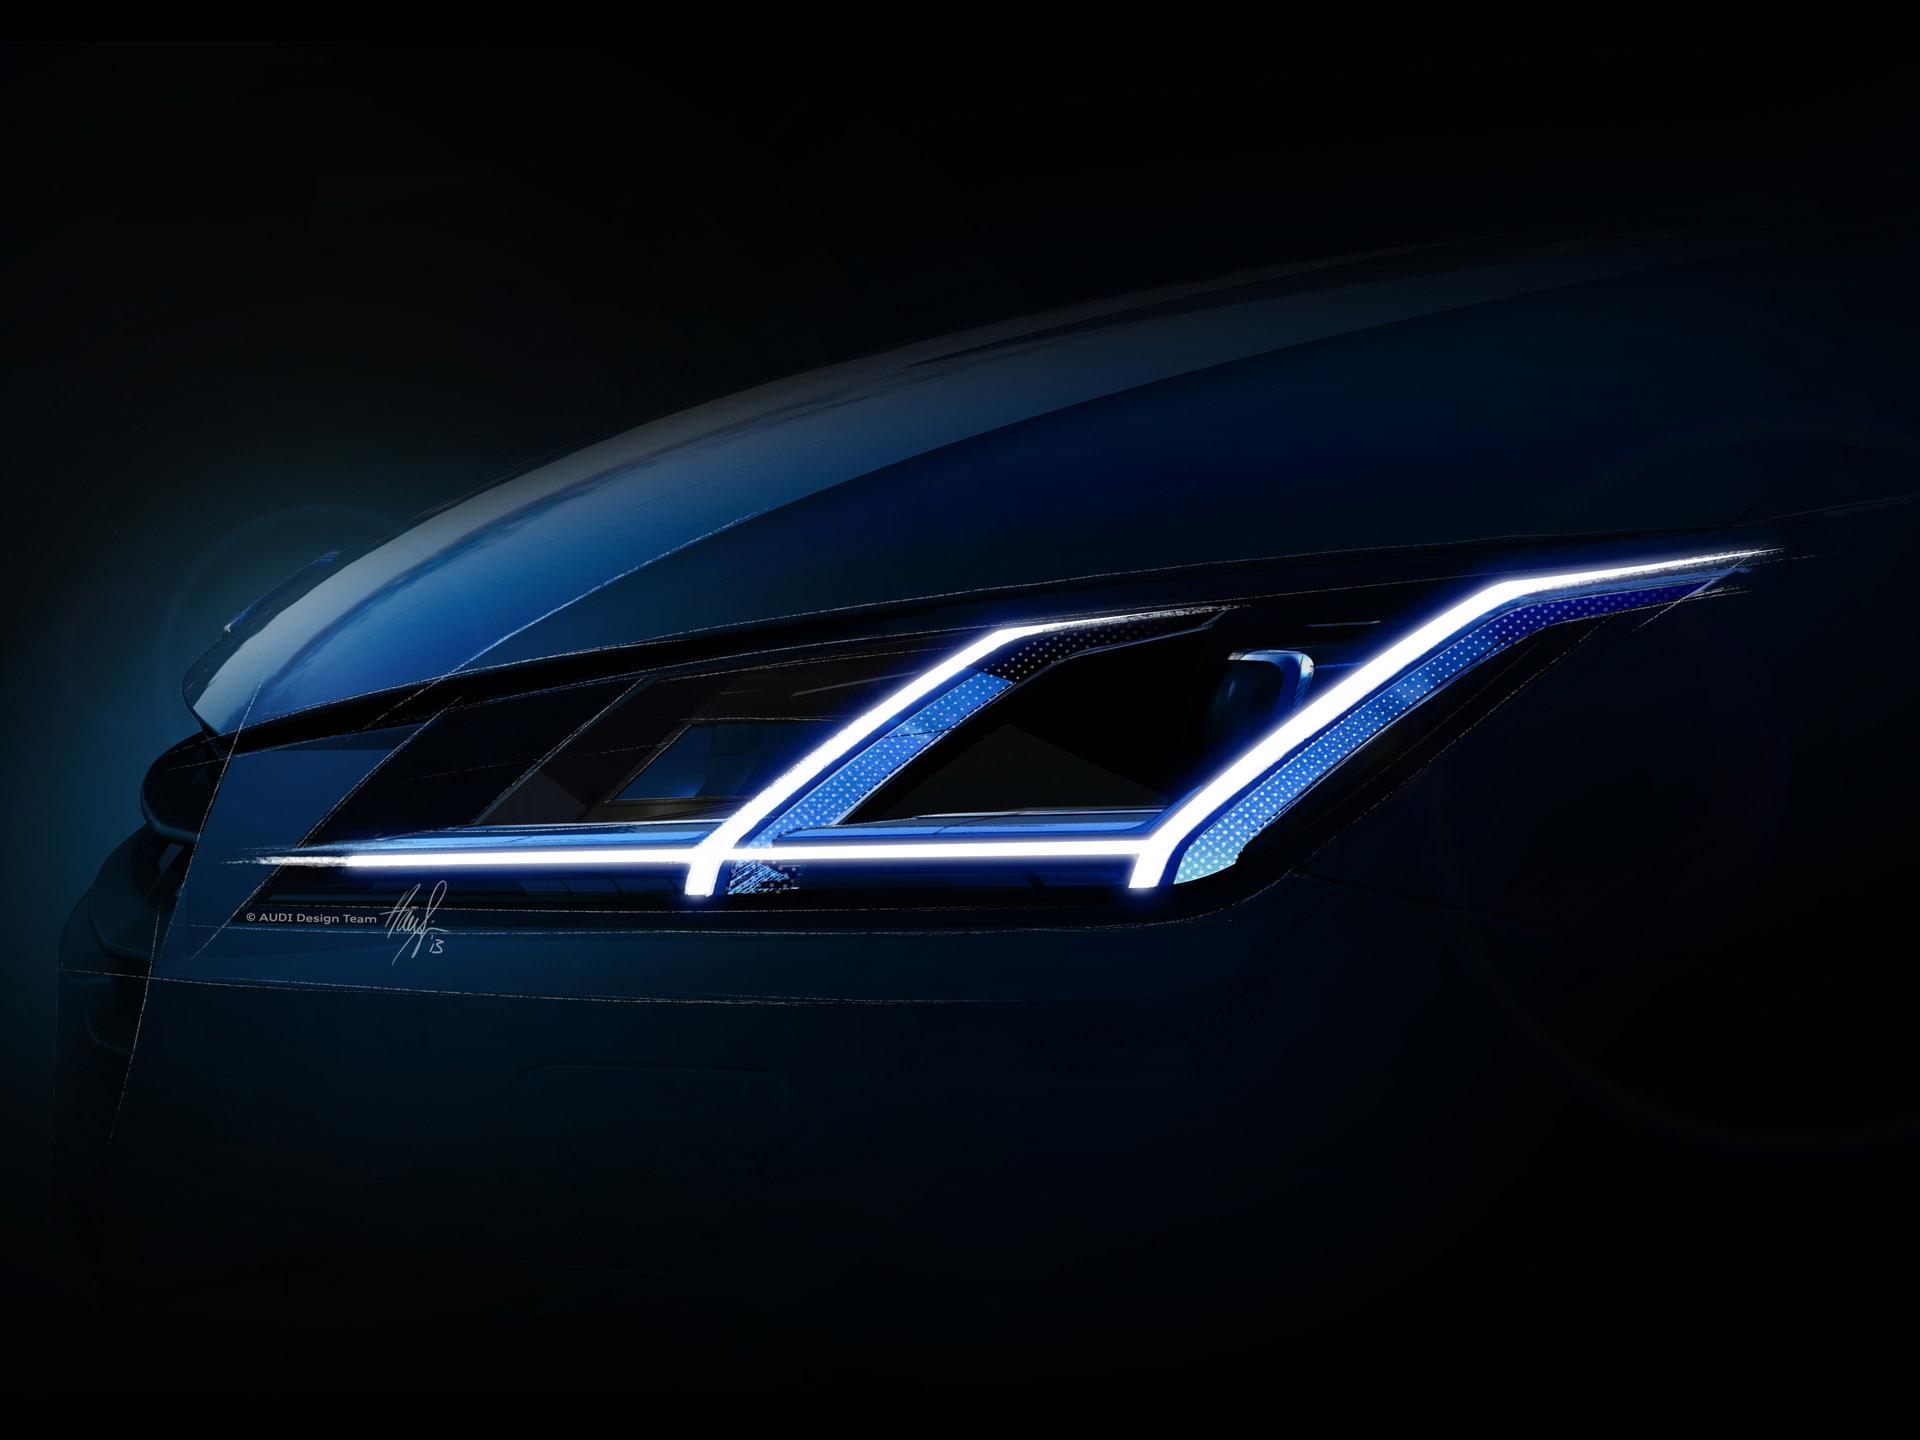 Audi Tt 2015 アウディに嵌まる 壁紙画像ブログ